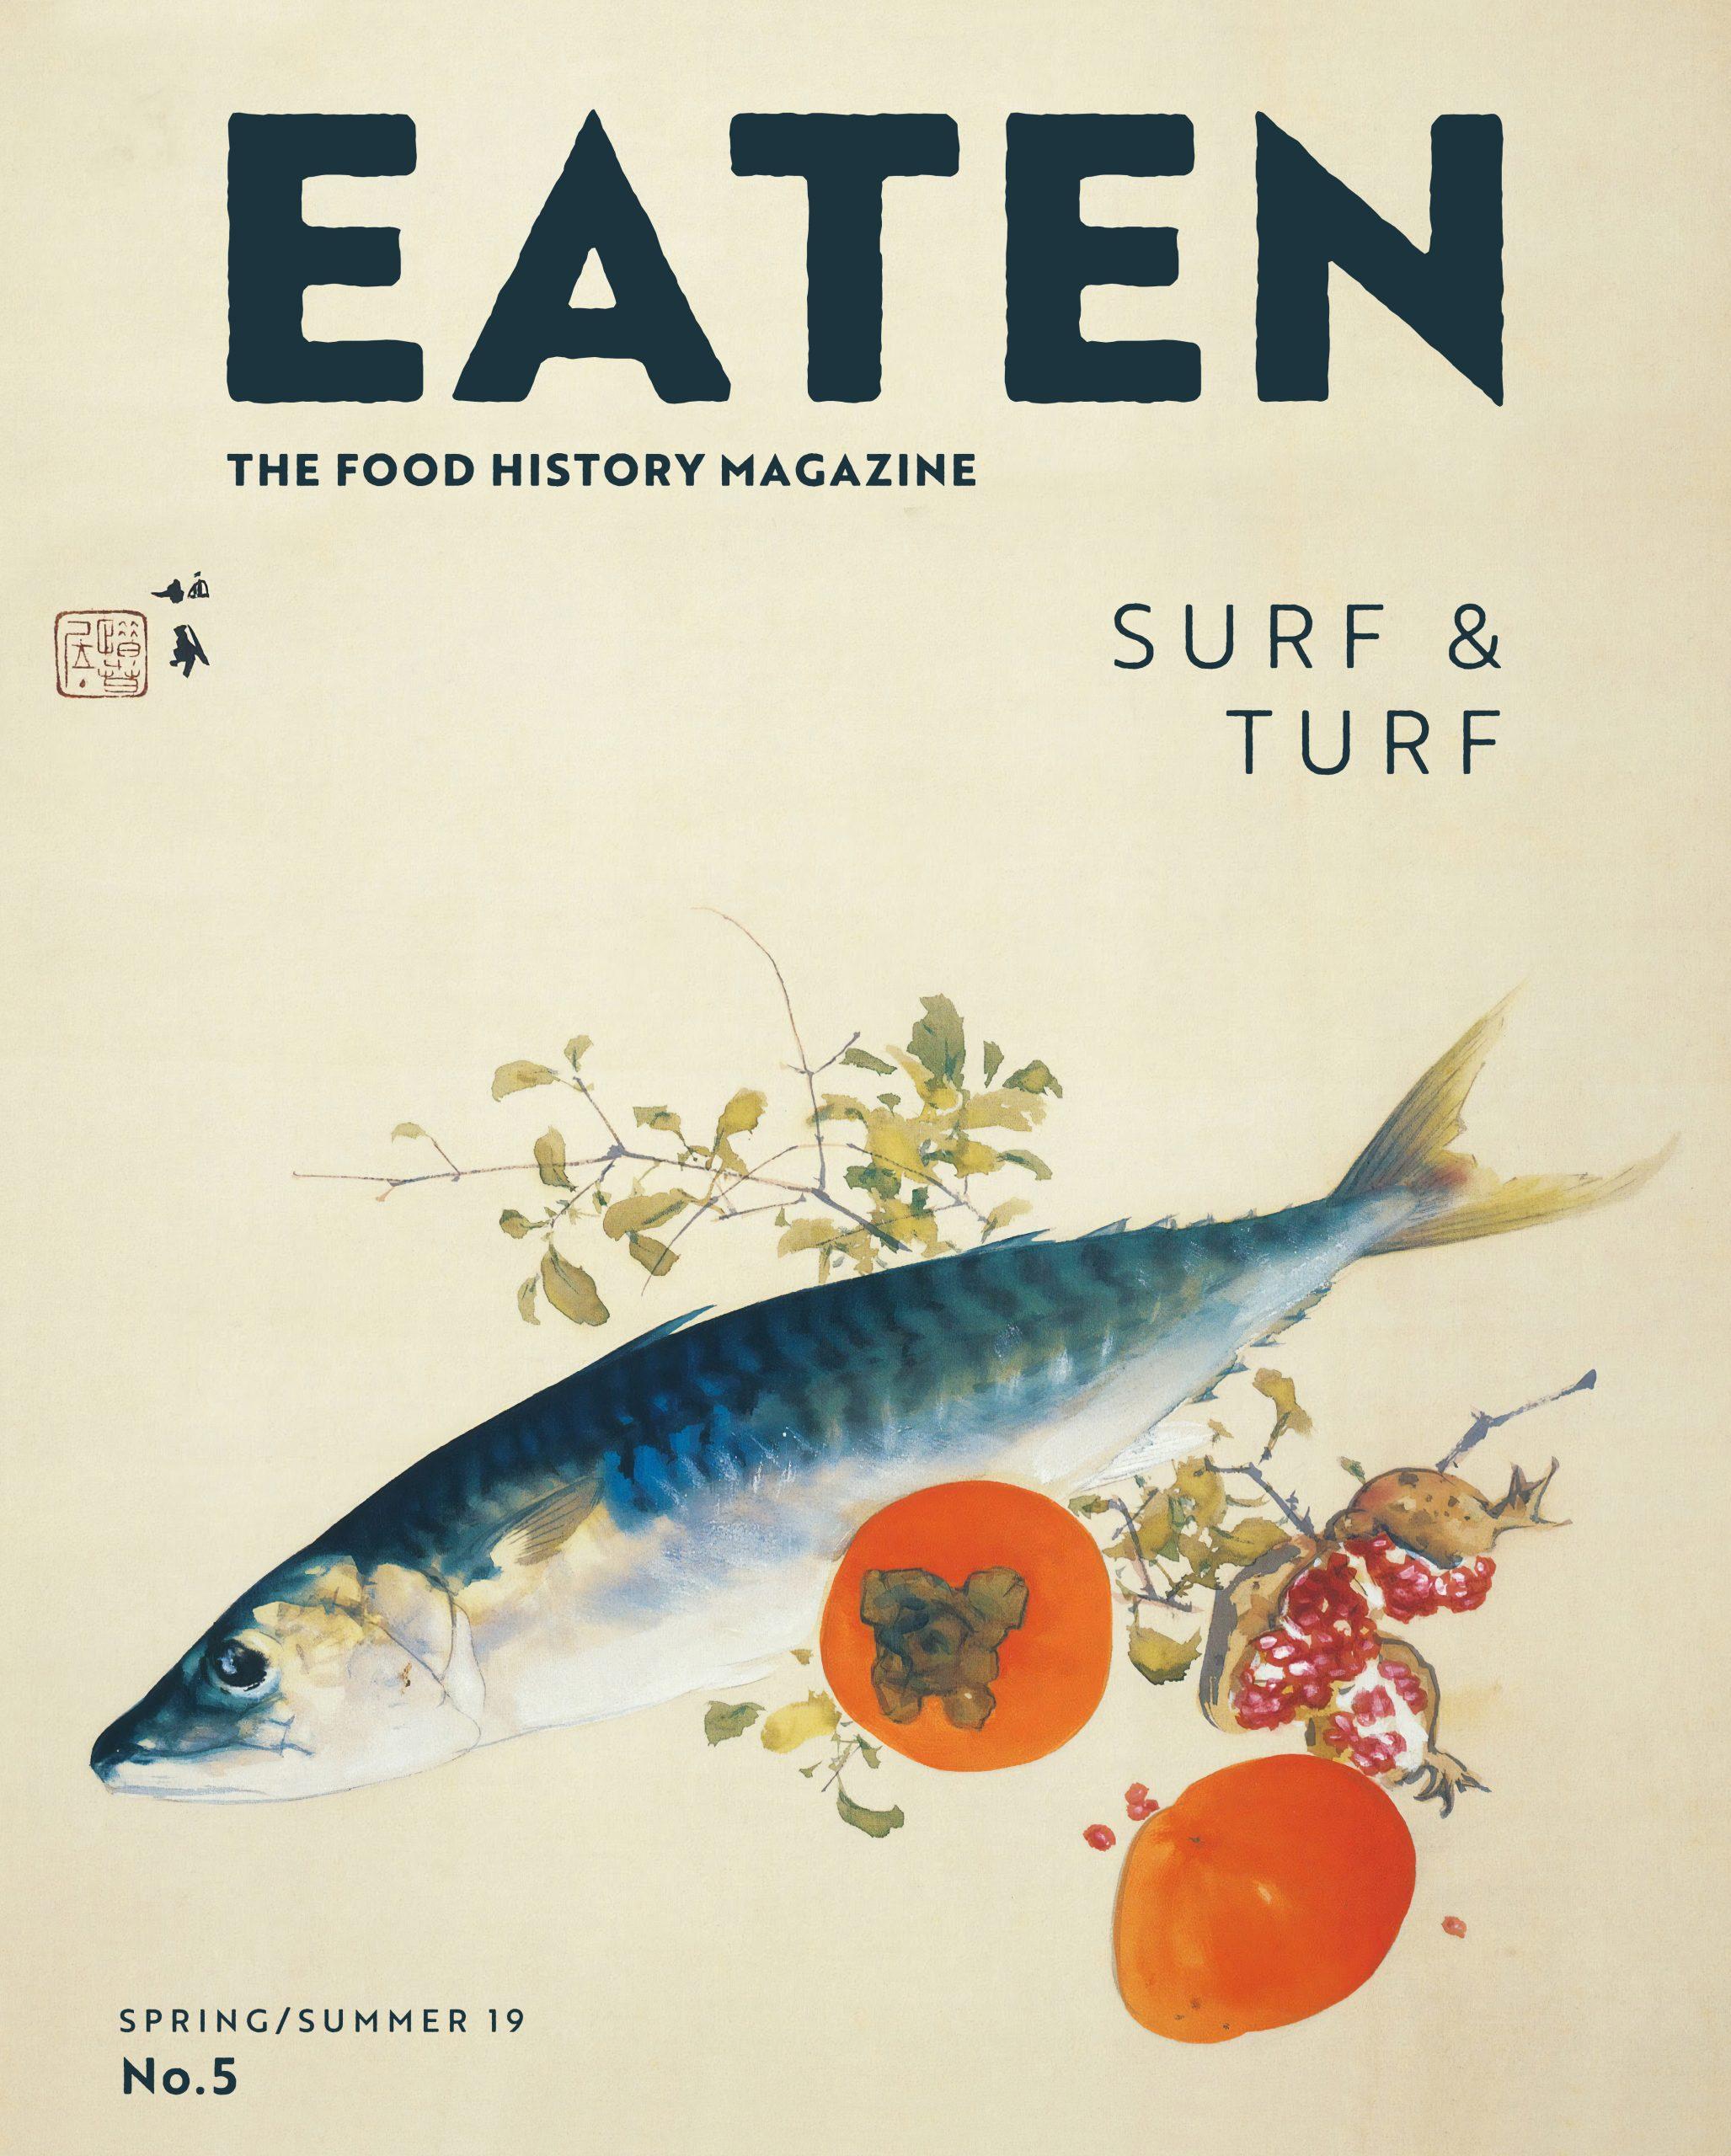 Award for food history magazine